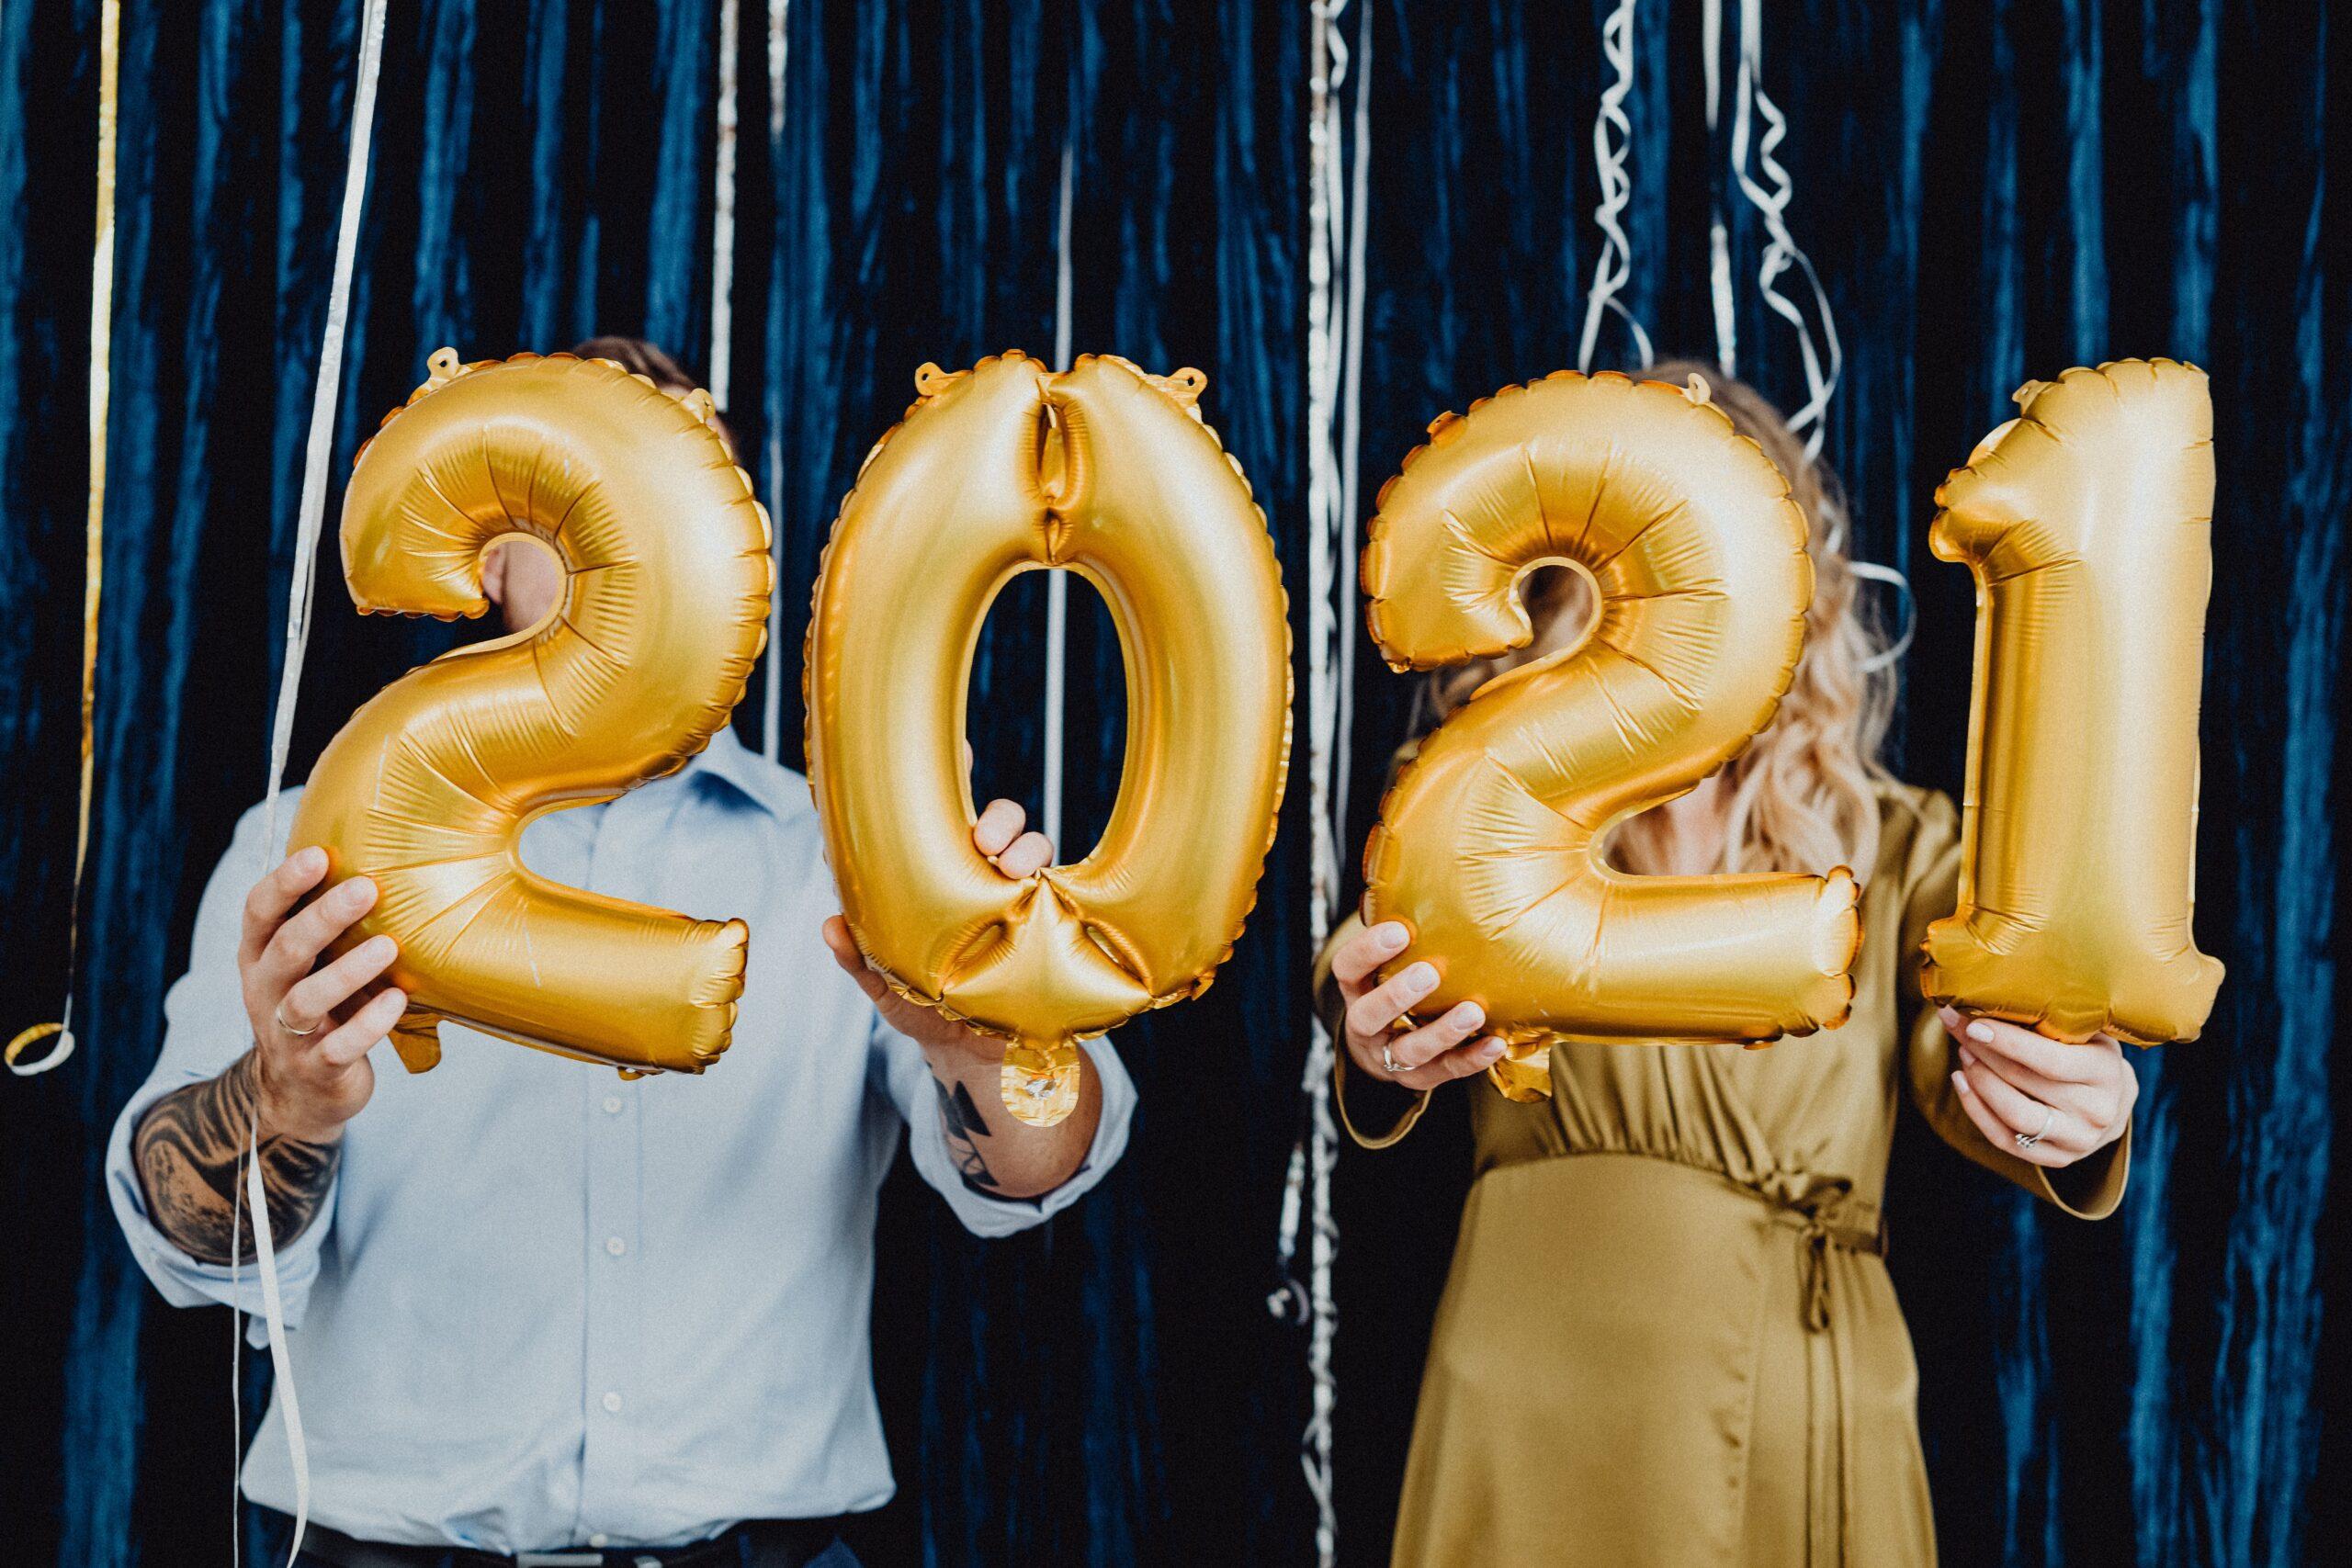 Make The Most of 2021 #stayhopeful